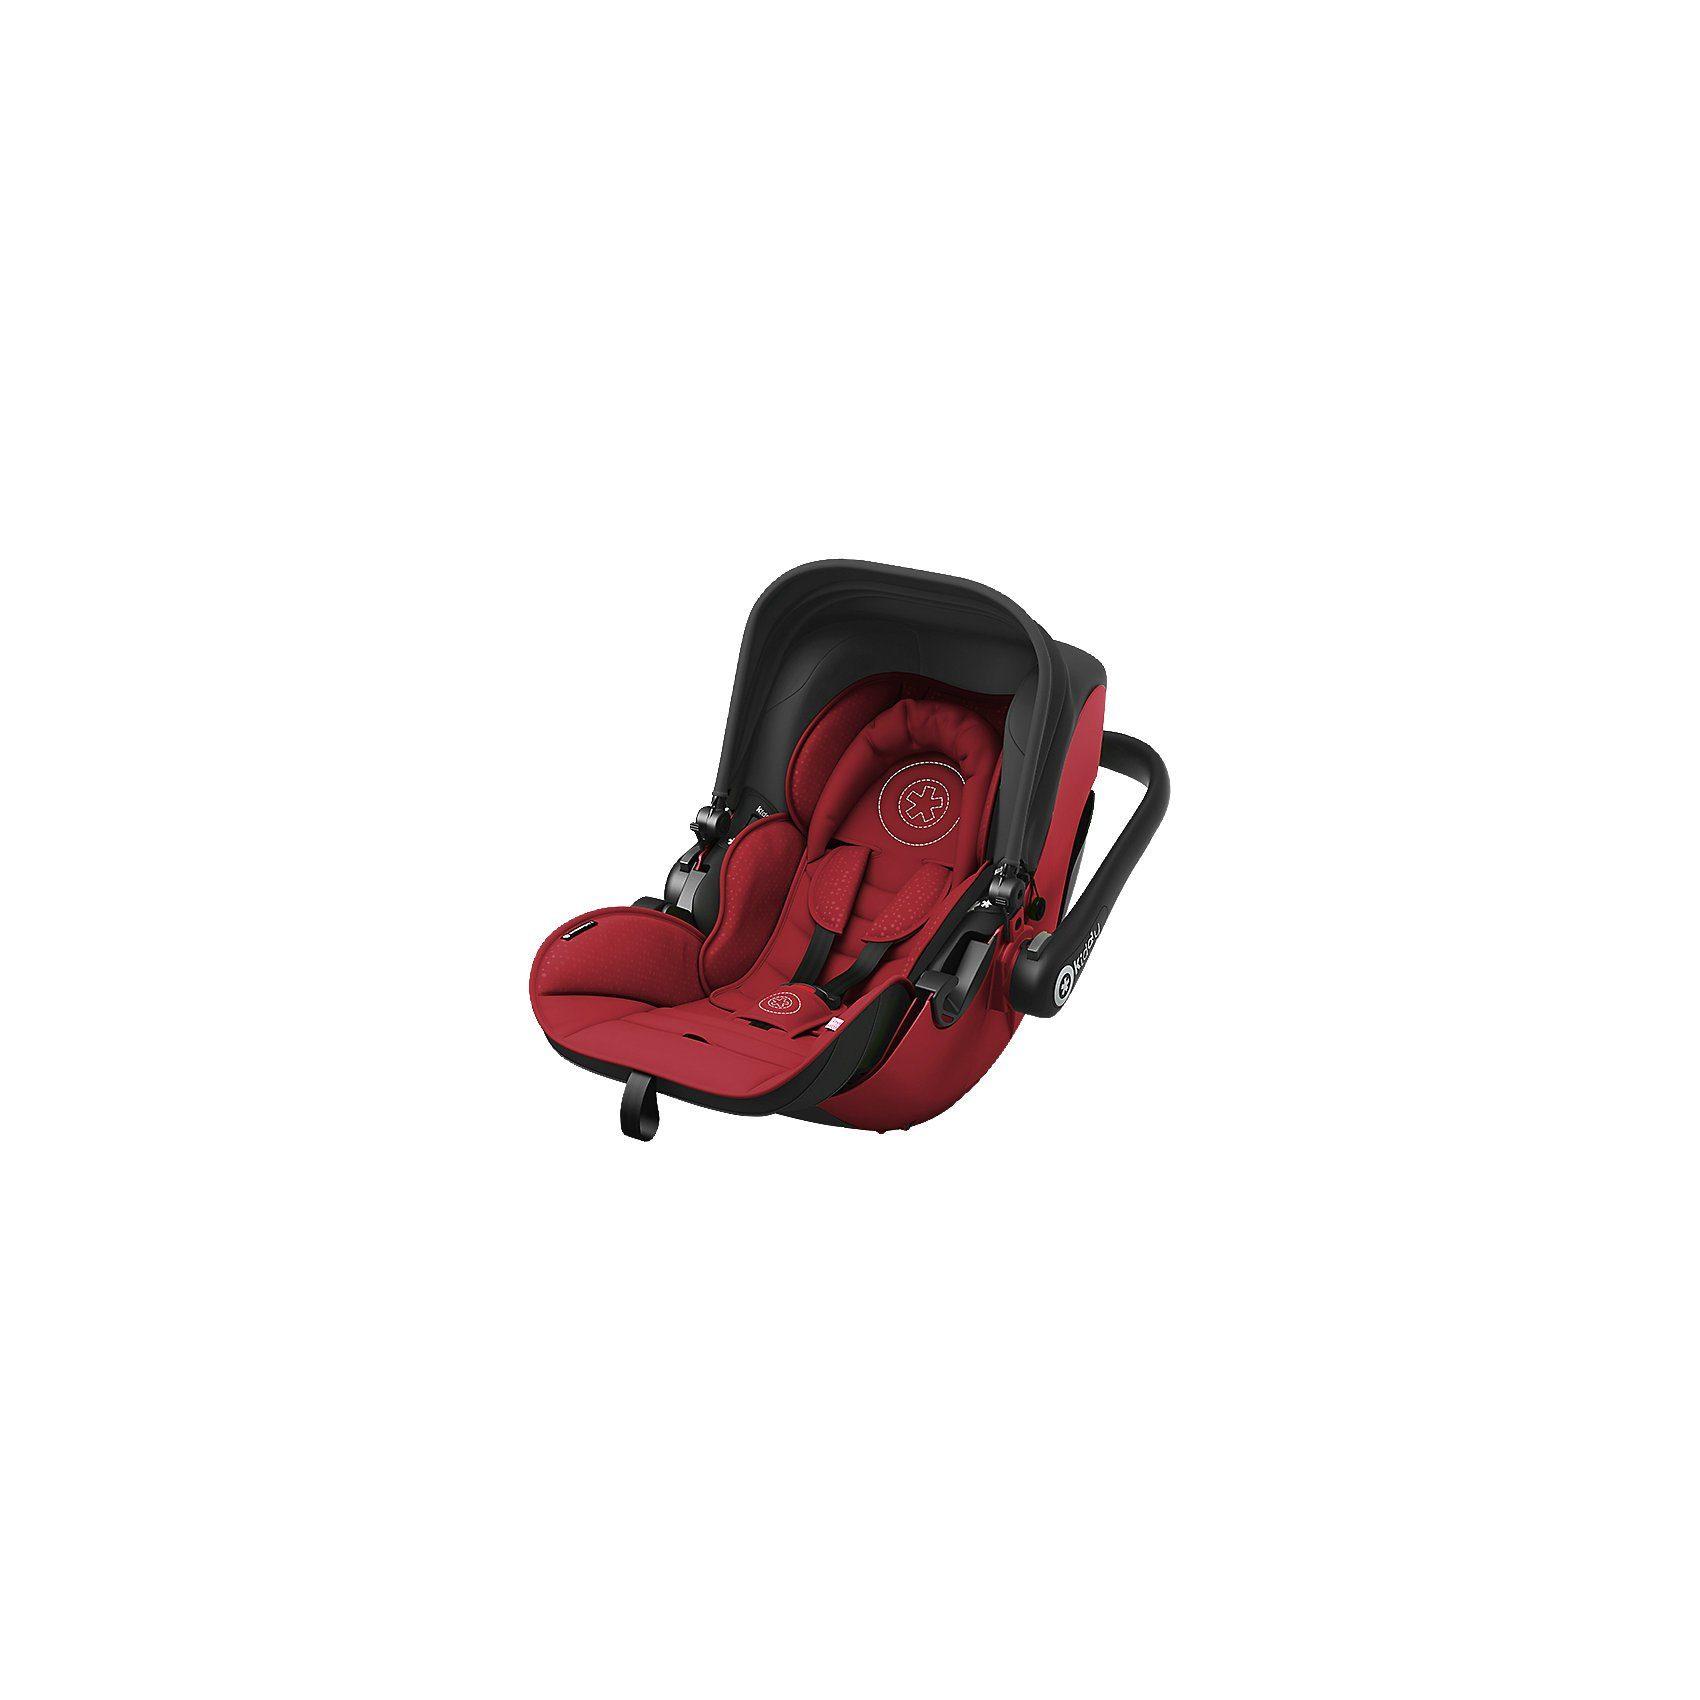 kiddy Babyschale Evolution Pro 2, ruby red, 2018